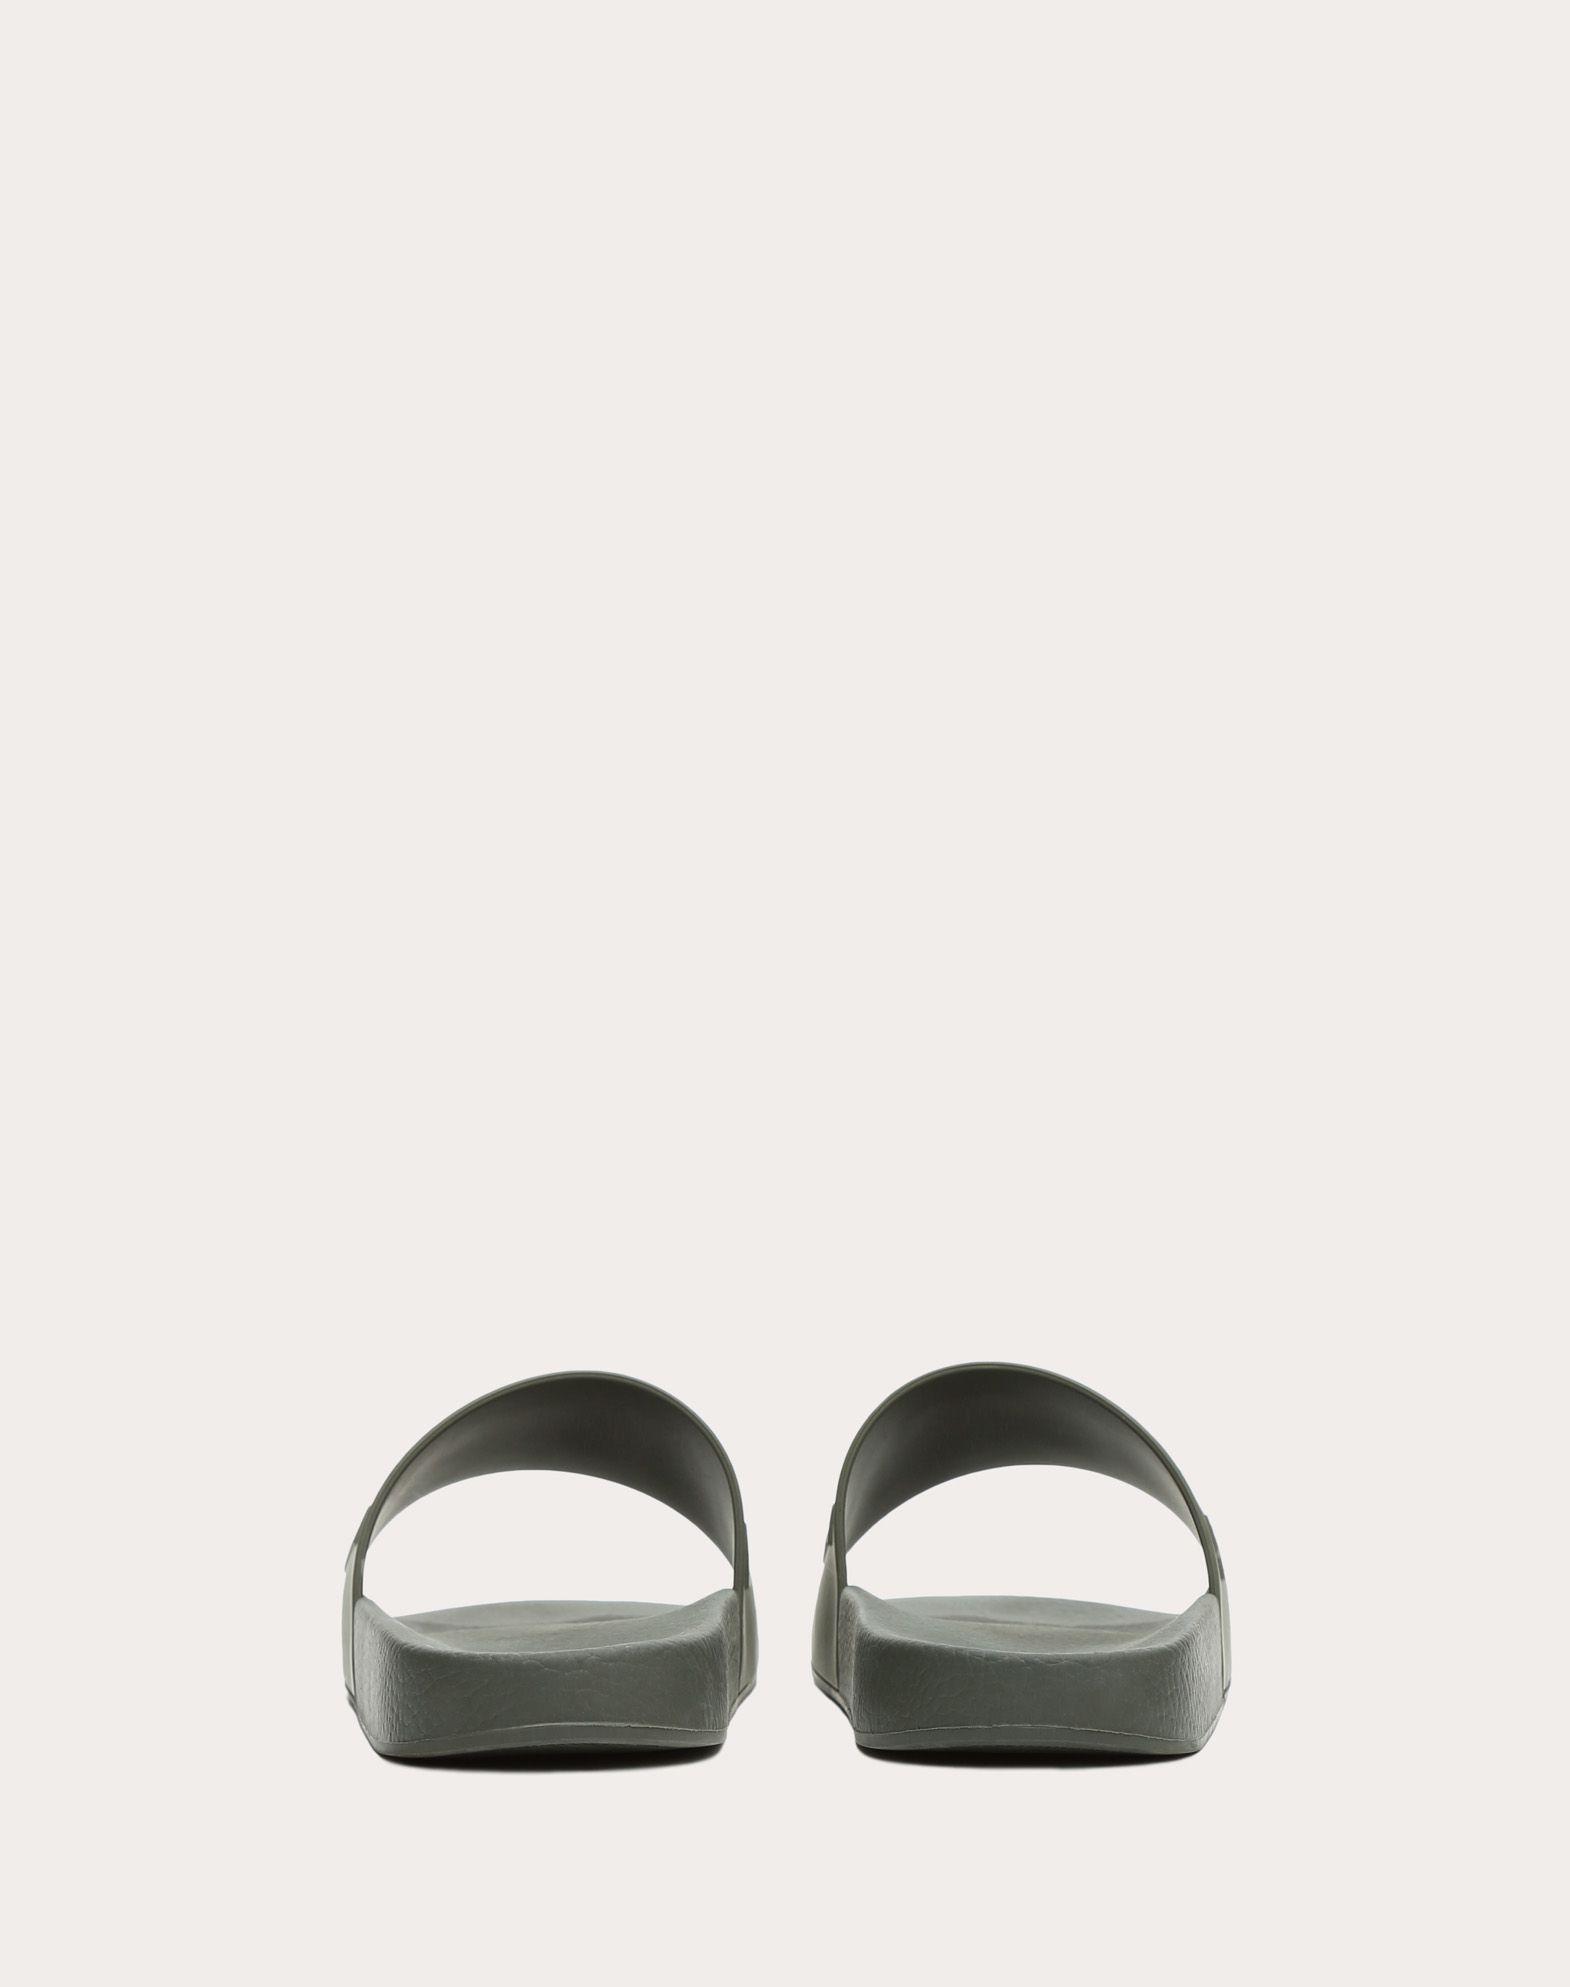 VALENTINO GARAVANI UOMO PY0S0873SYE GRE 橡胶拖鞋式凉鞋 U d